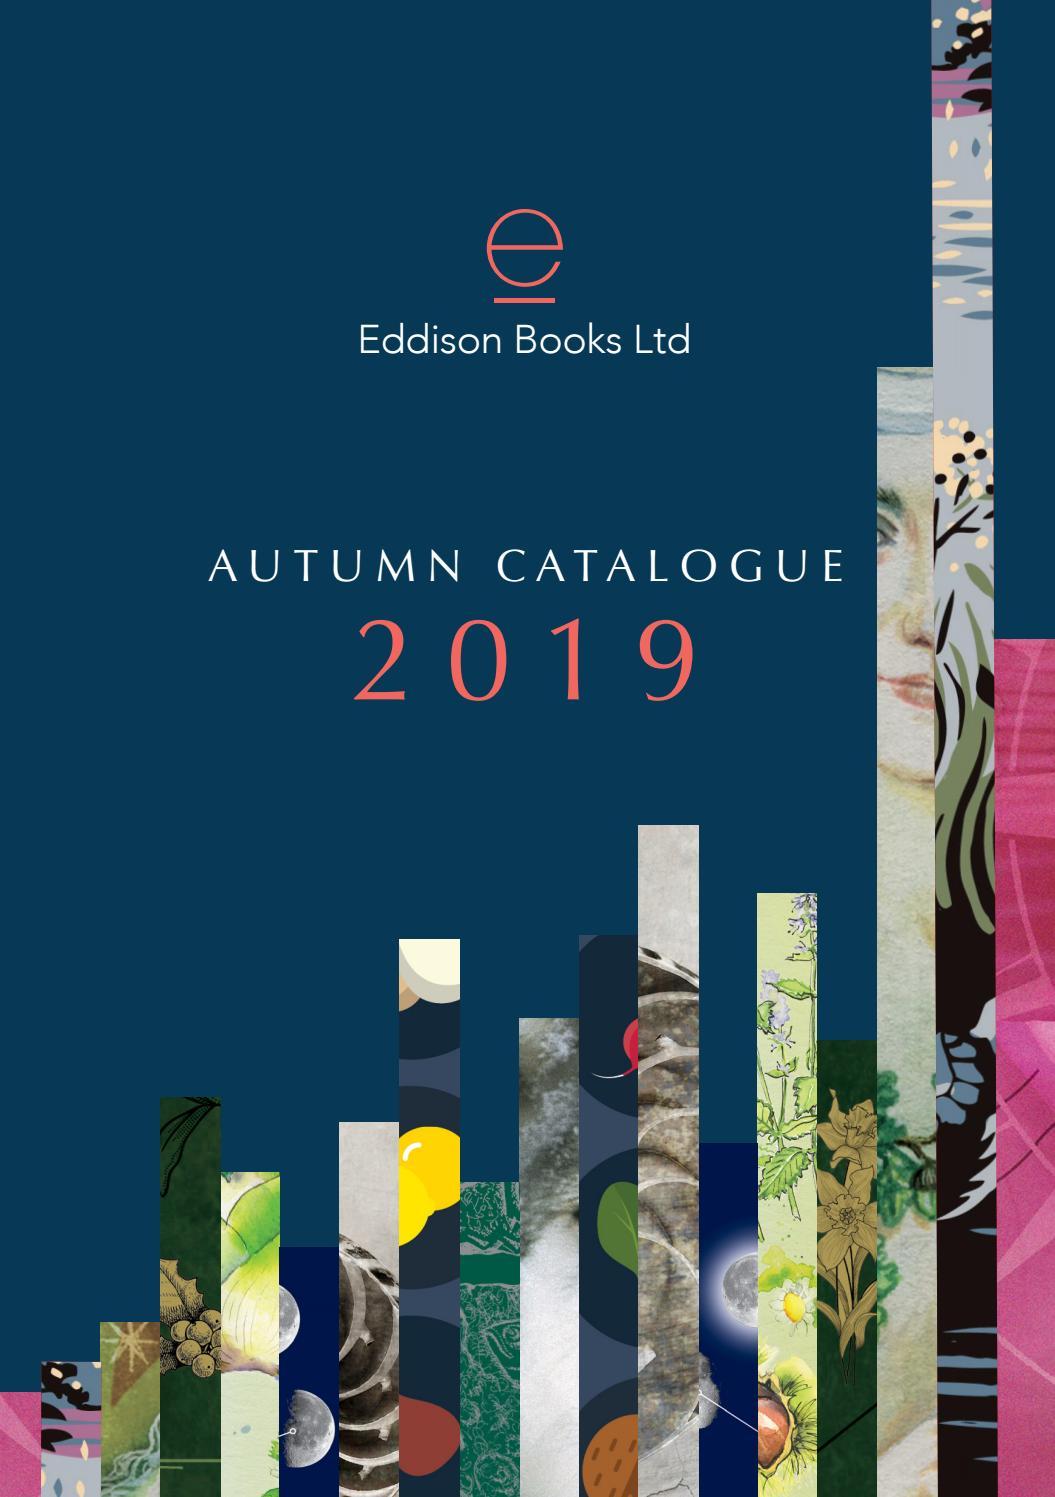 HELP Books Catalogue 2019 | Media | Books